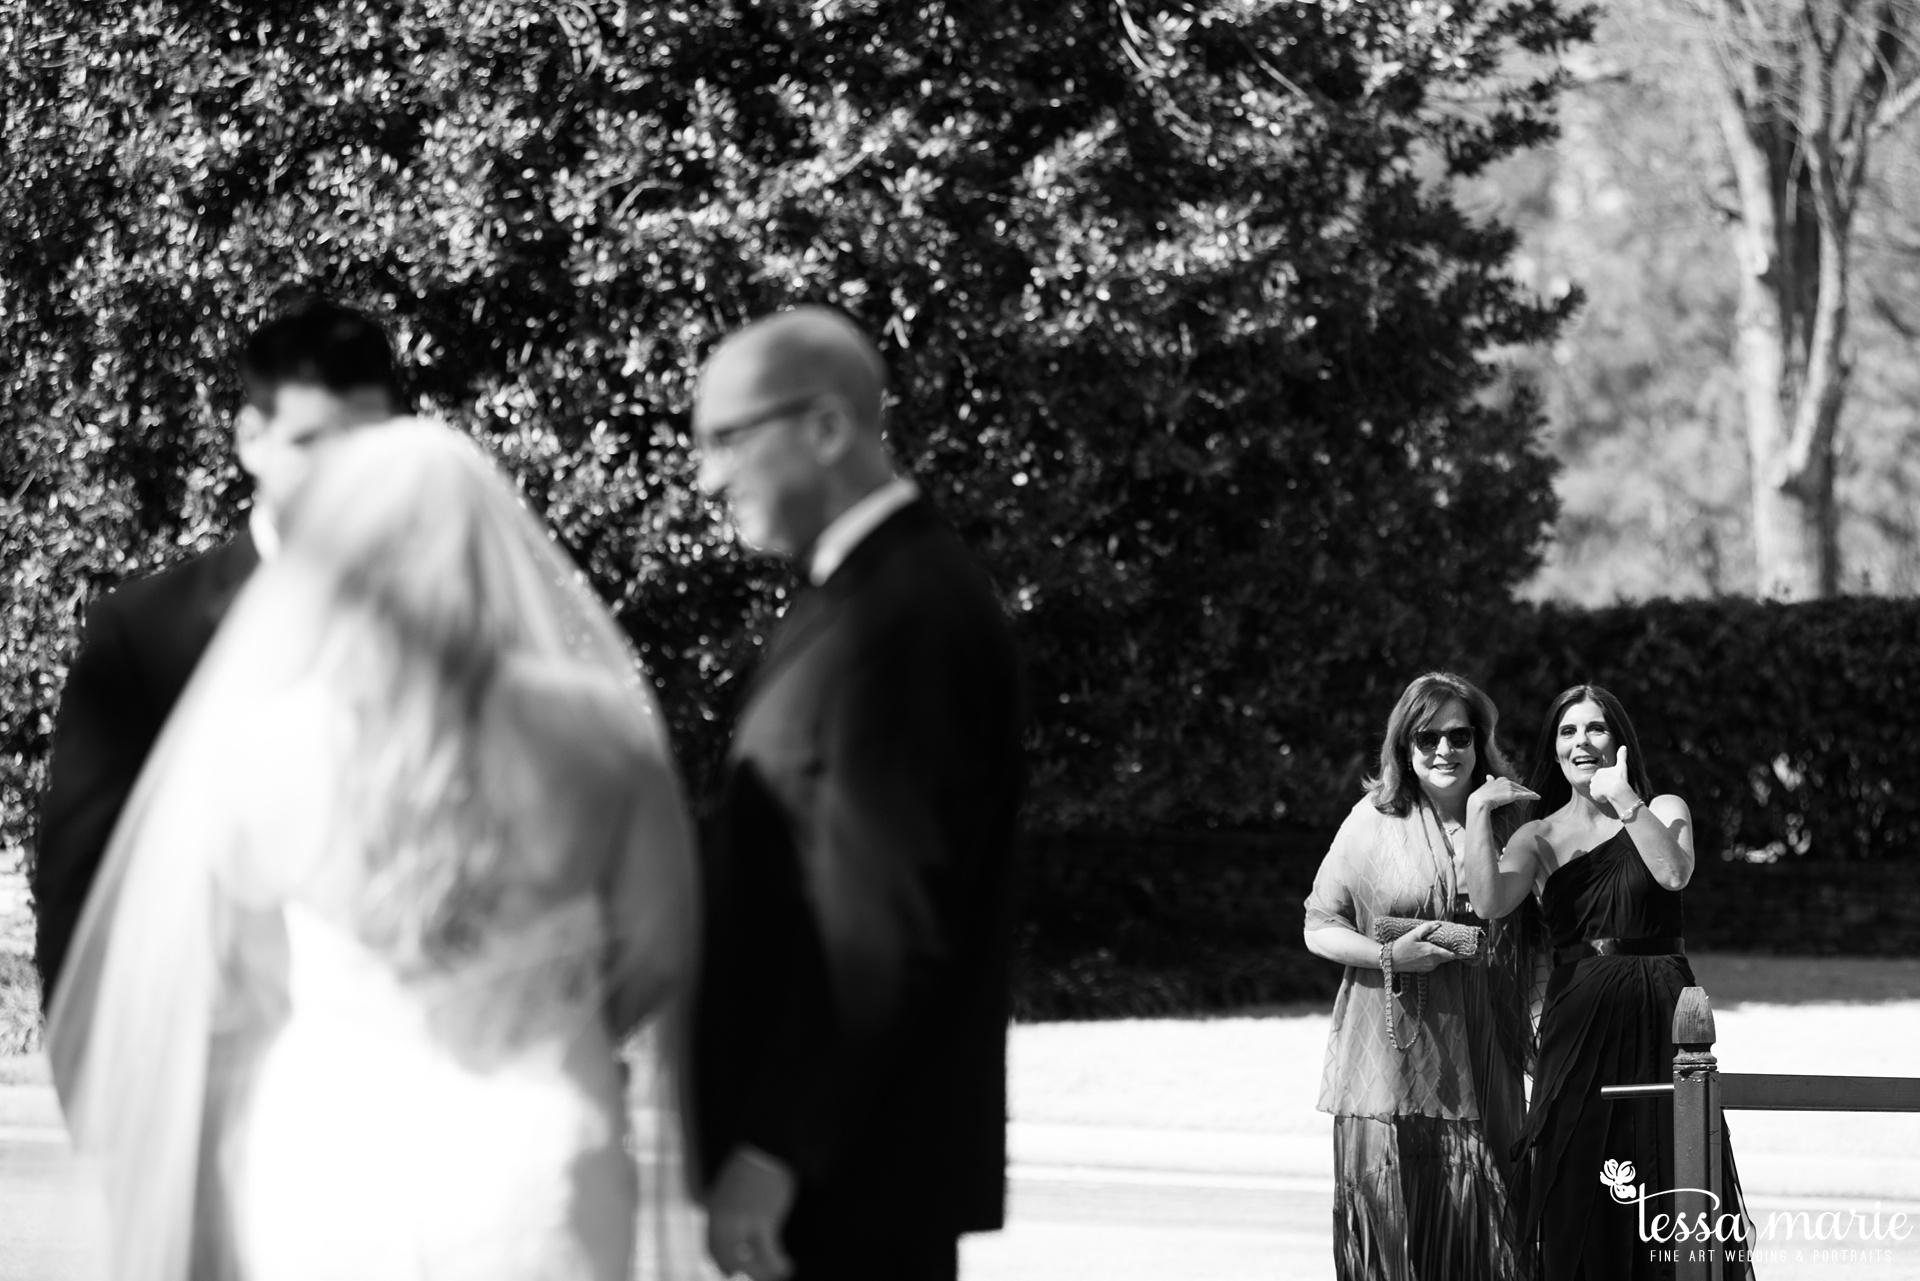 tessa_marie_legacy_moments_storytelling_candid_emotionally_driven_wedding_photographer_atlanta_wedding_photography_st_ives_country_club_wedding_boukates_bridals_by_lori_0007